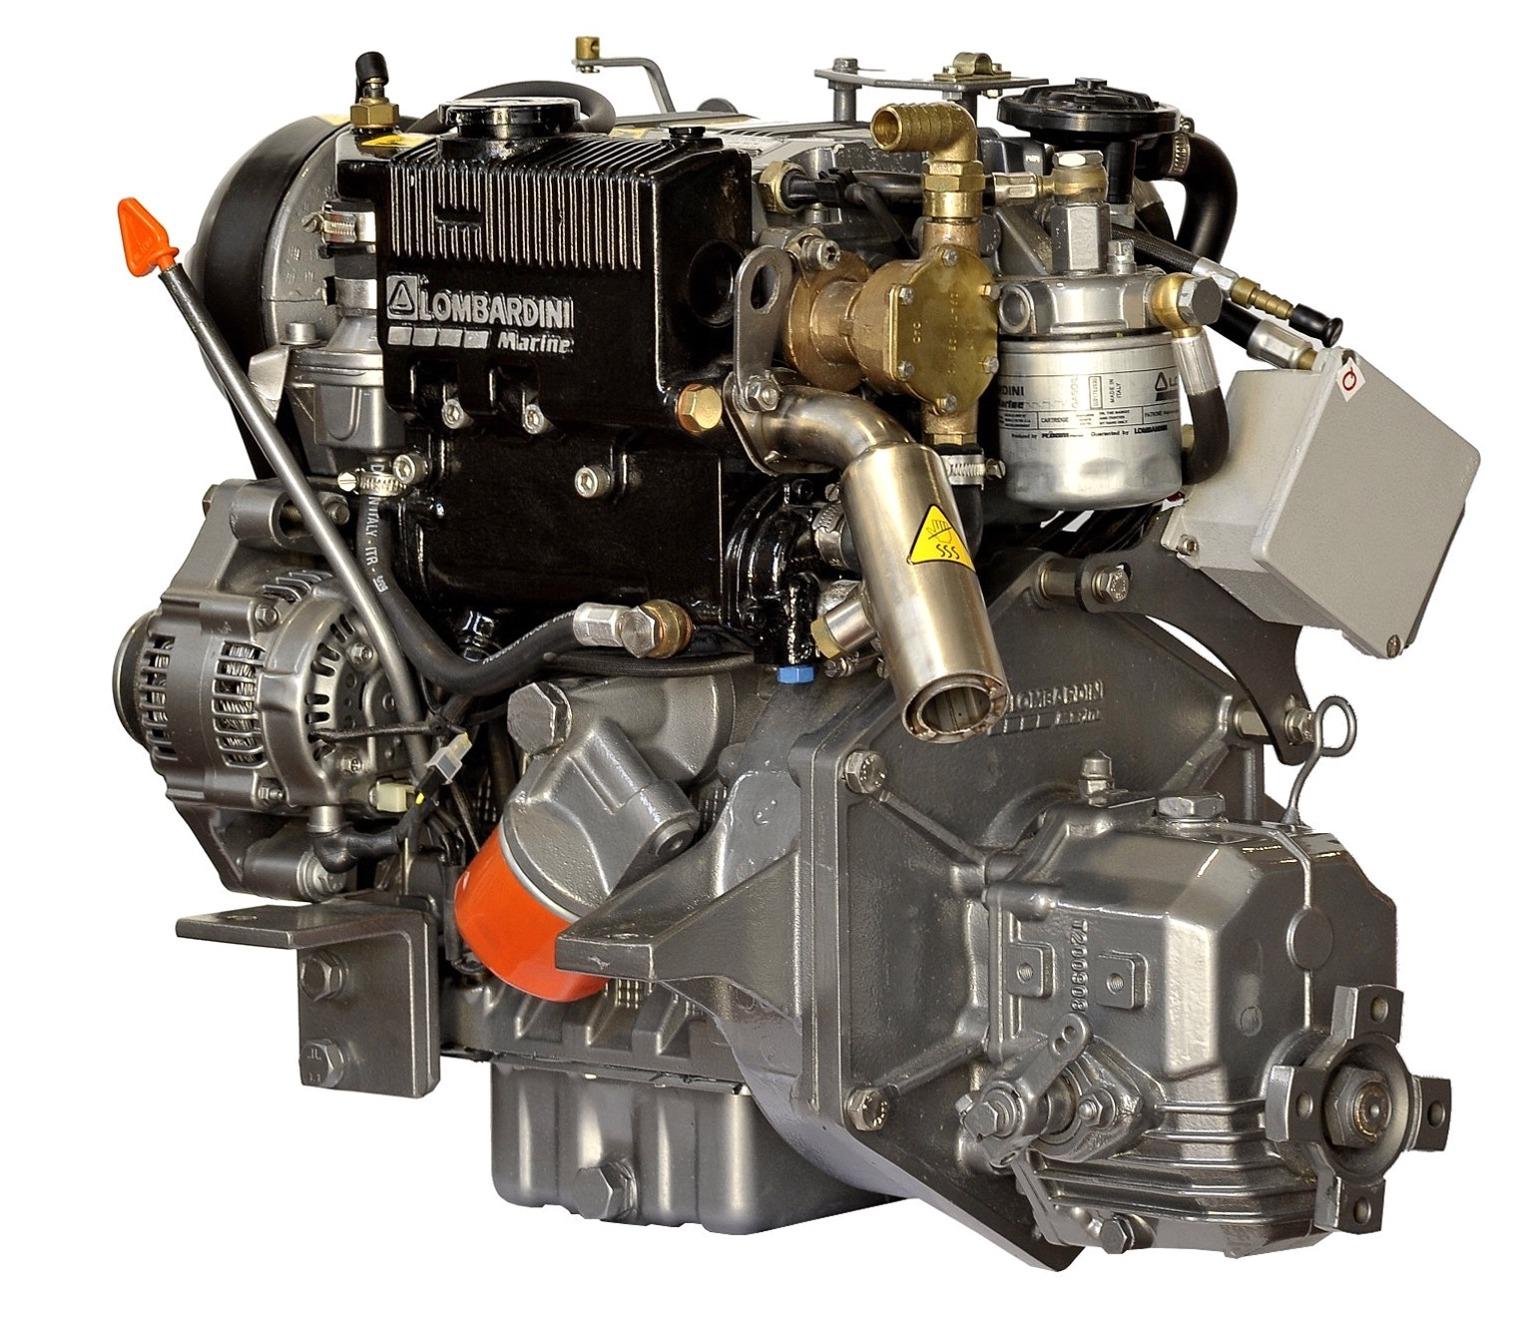 Lombardini LDW502M, 11 hk dieselmotor med backslag TMC40